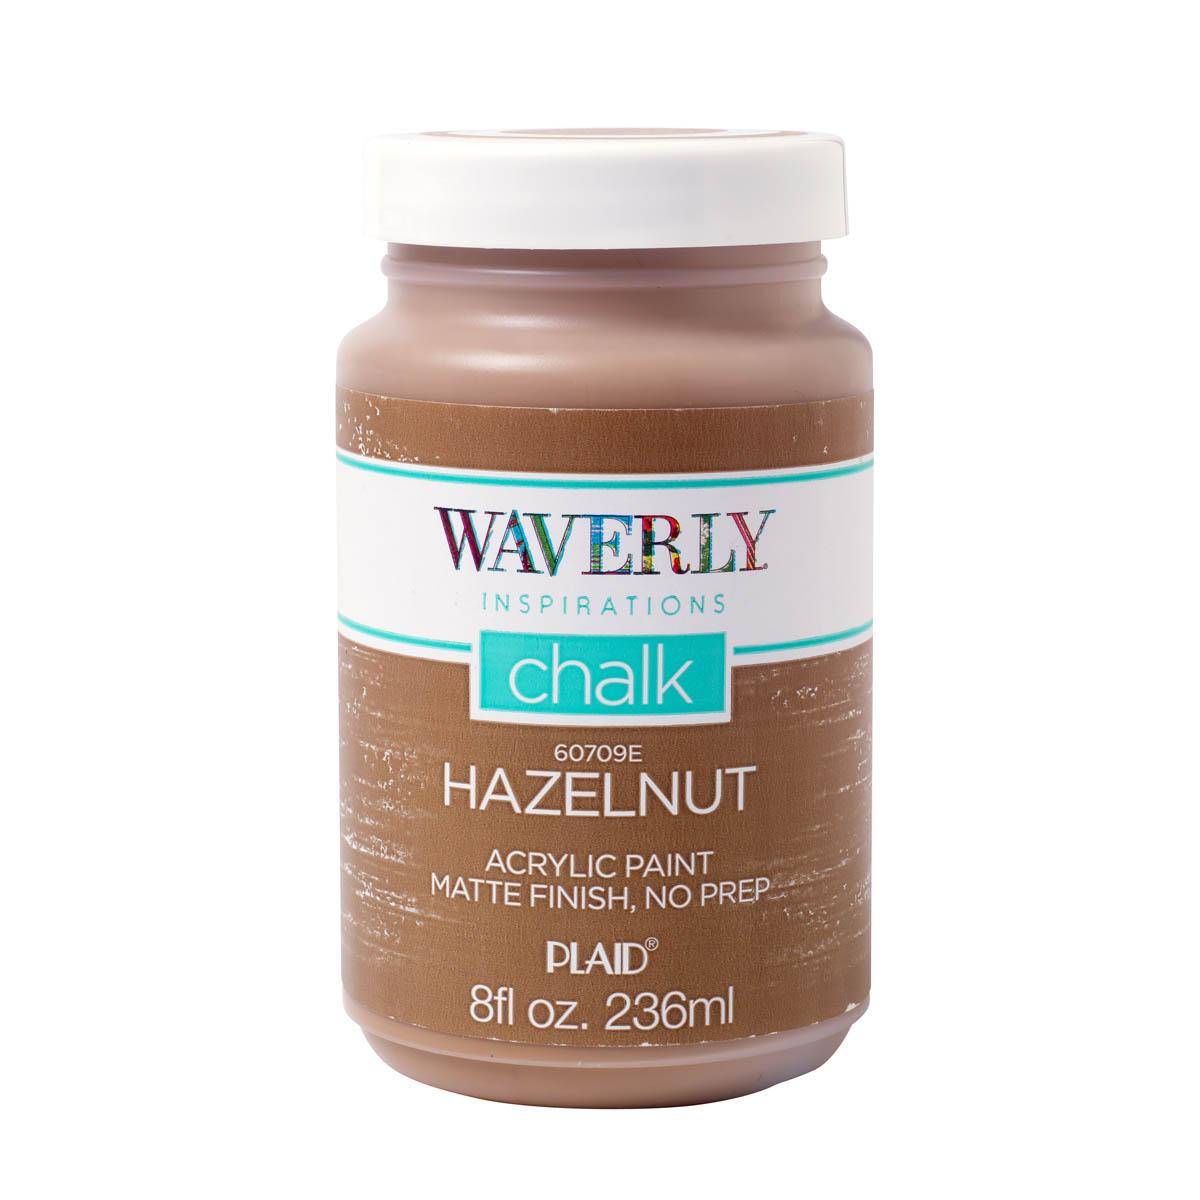 Waverly ® Inspirations Chalk Acrylic Paint - Hazelnut, 8 oz.